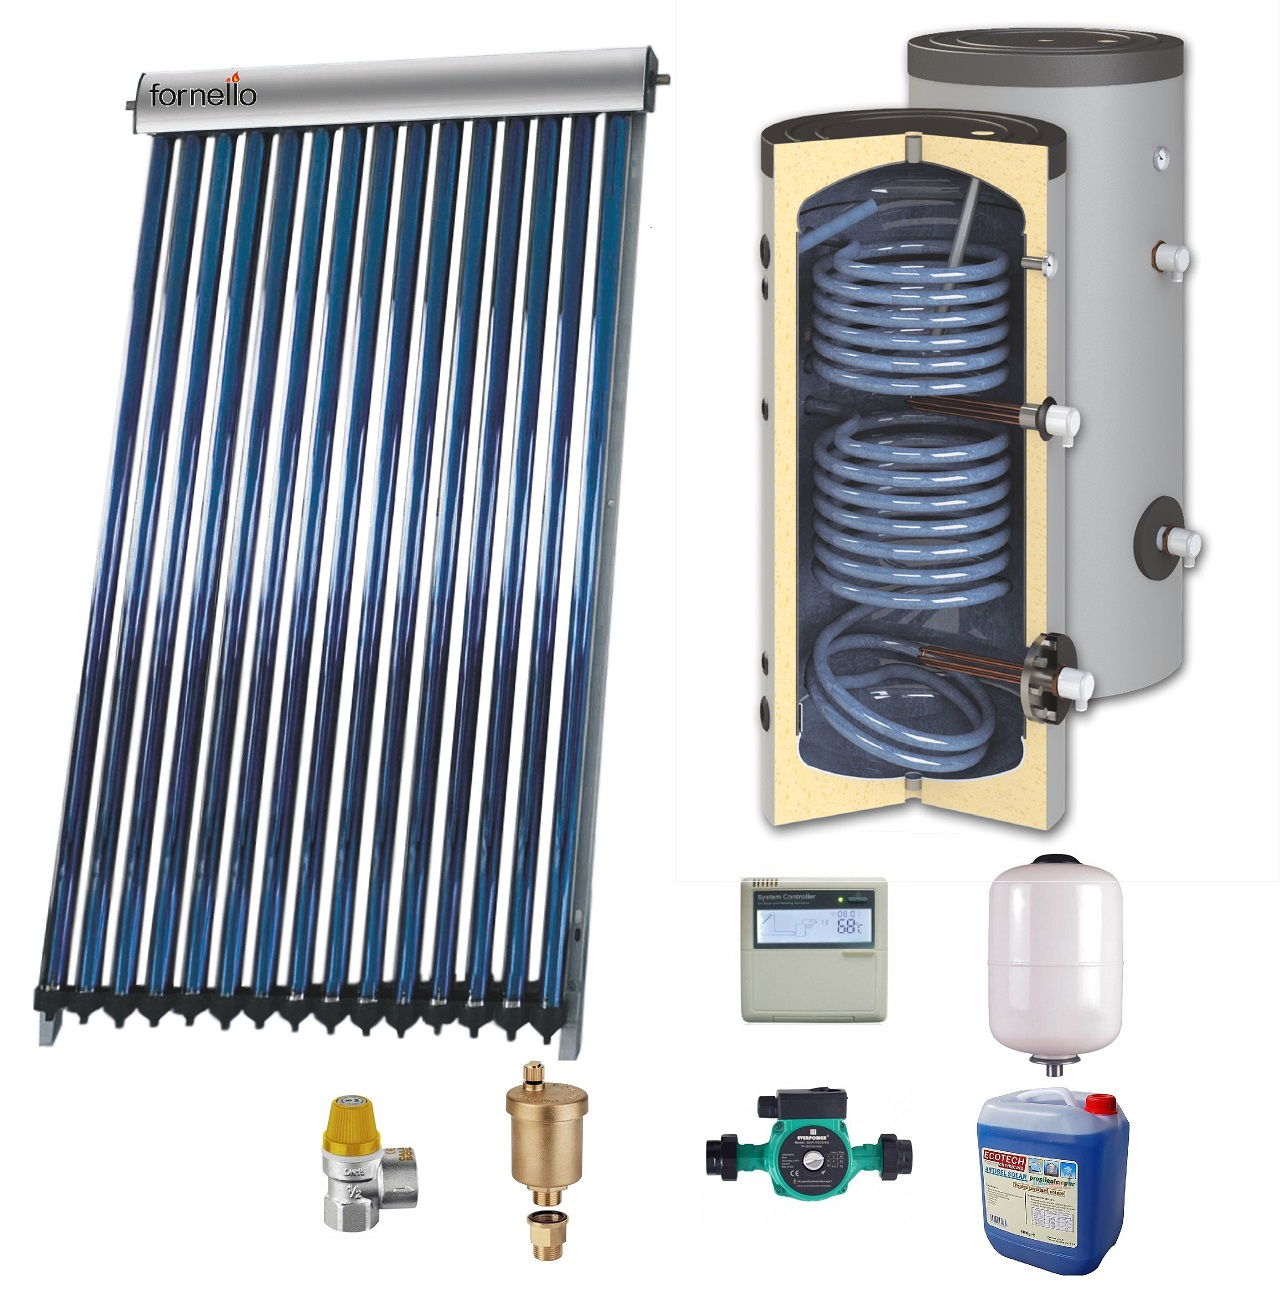 Sistem solar presurizat , panou Sunsystem VTC 30 tuburi, boiler cu 2 serpentine si rezistenta electrica Sunsystem SON 200 litri, pompa 25-60, controller, vas expansiune, antigel, supapa 1/2, aerisitor 1/2 imagine fornello.ro